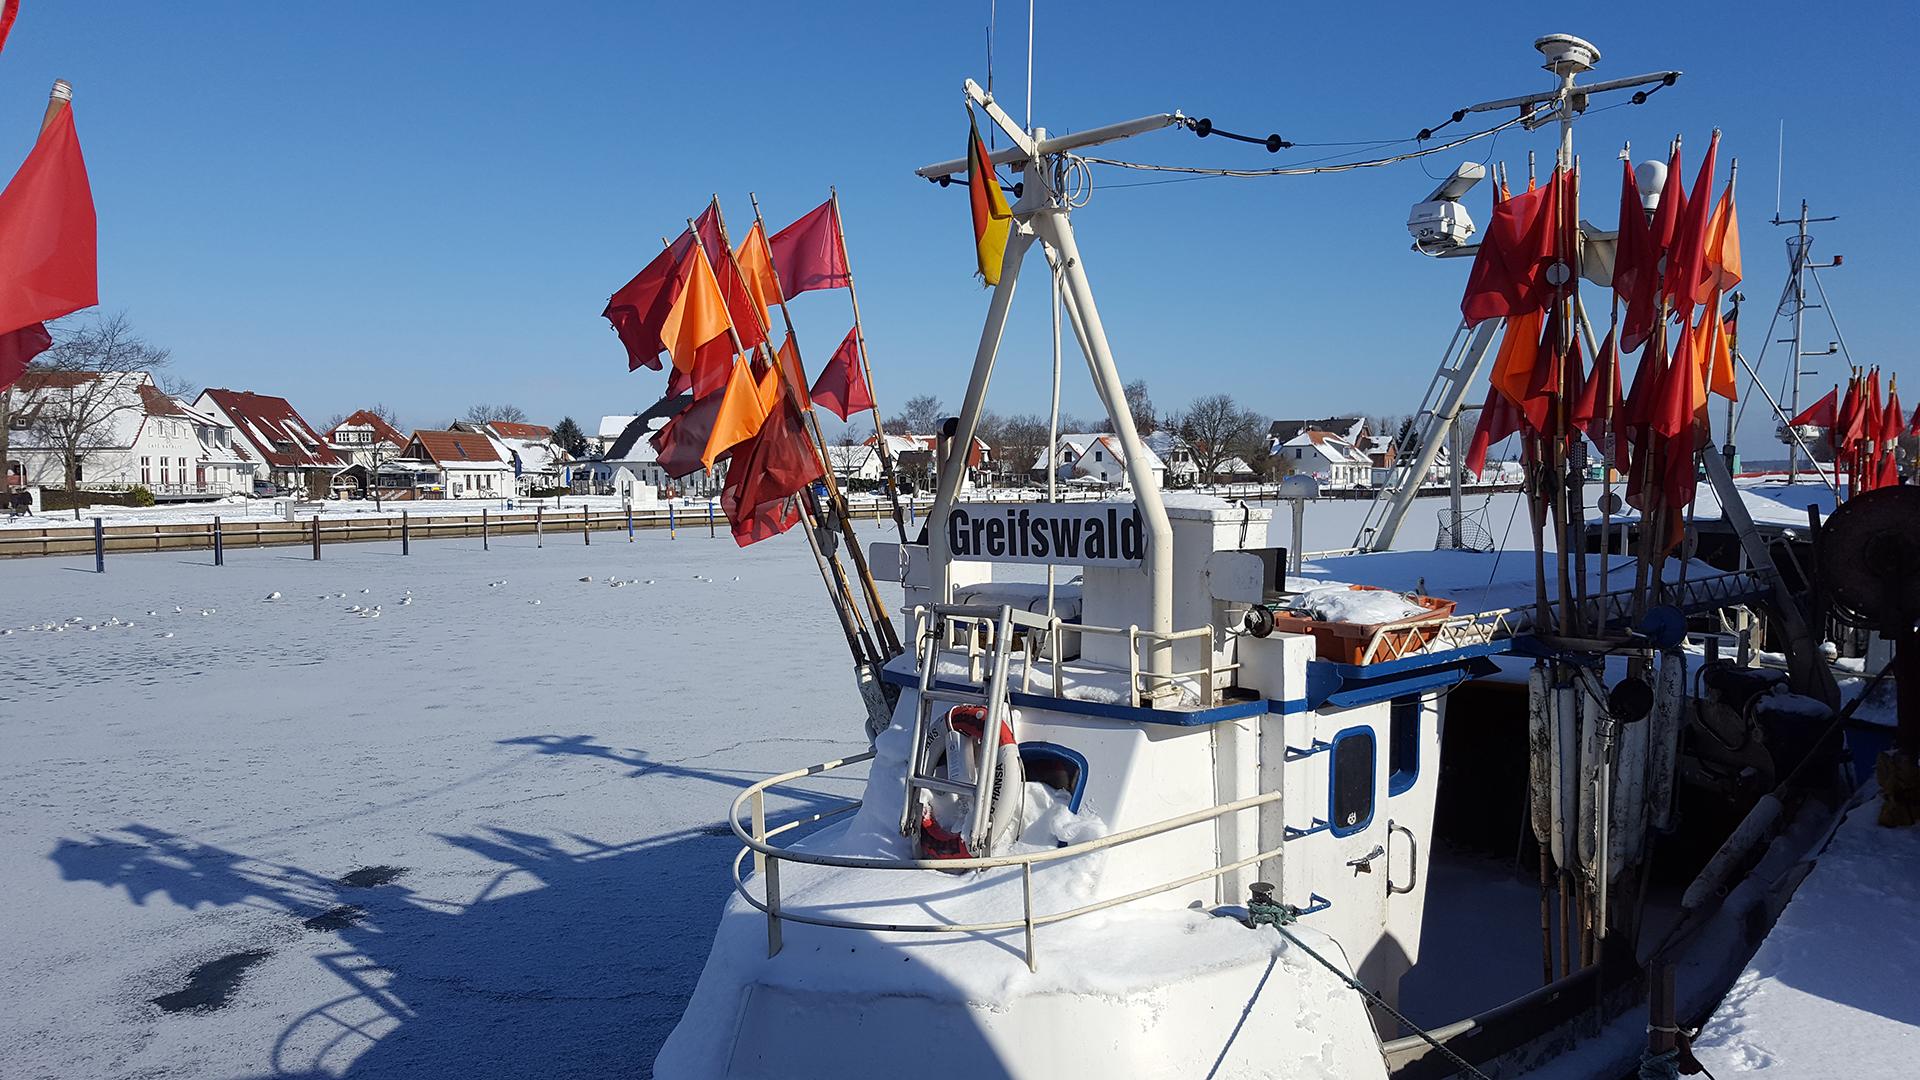 Winter an der Brücke in Greifswald-Wieck